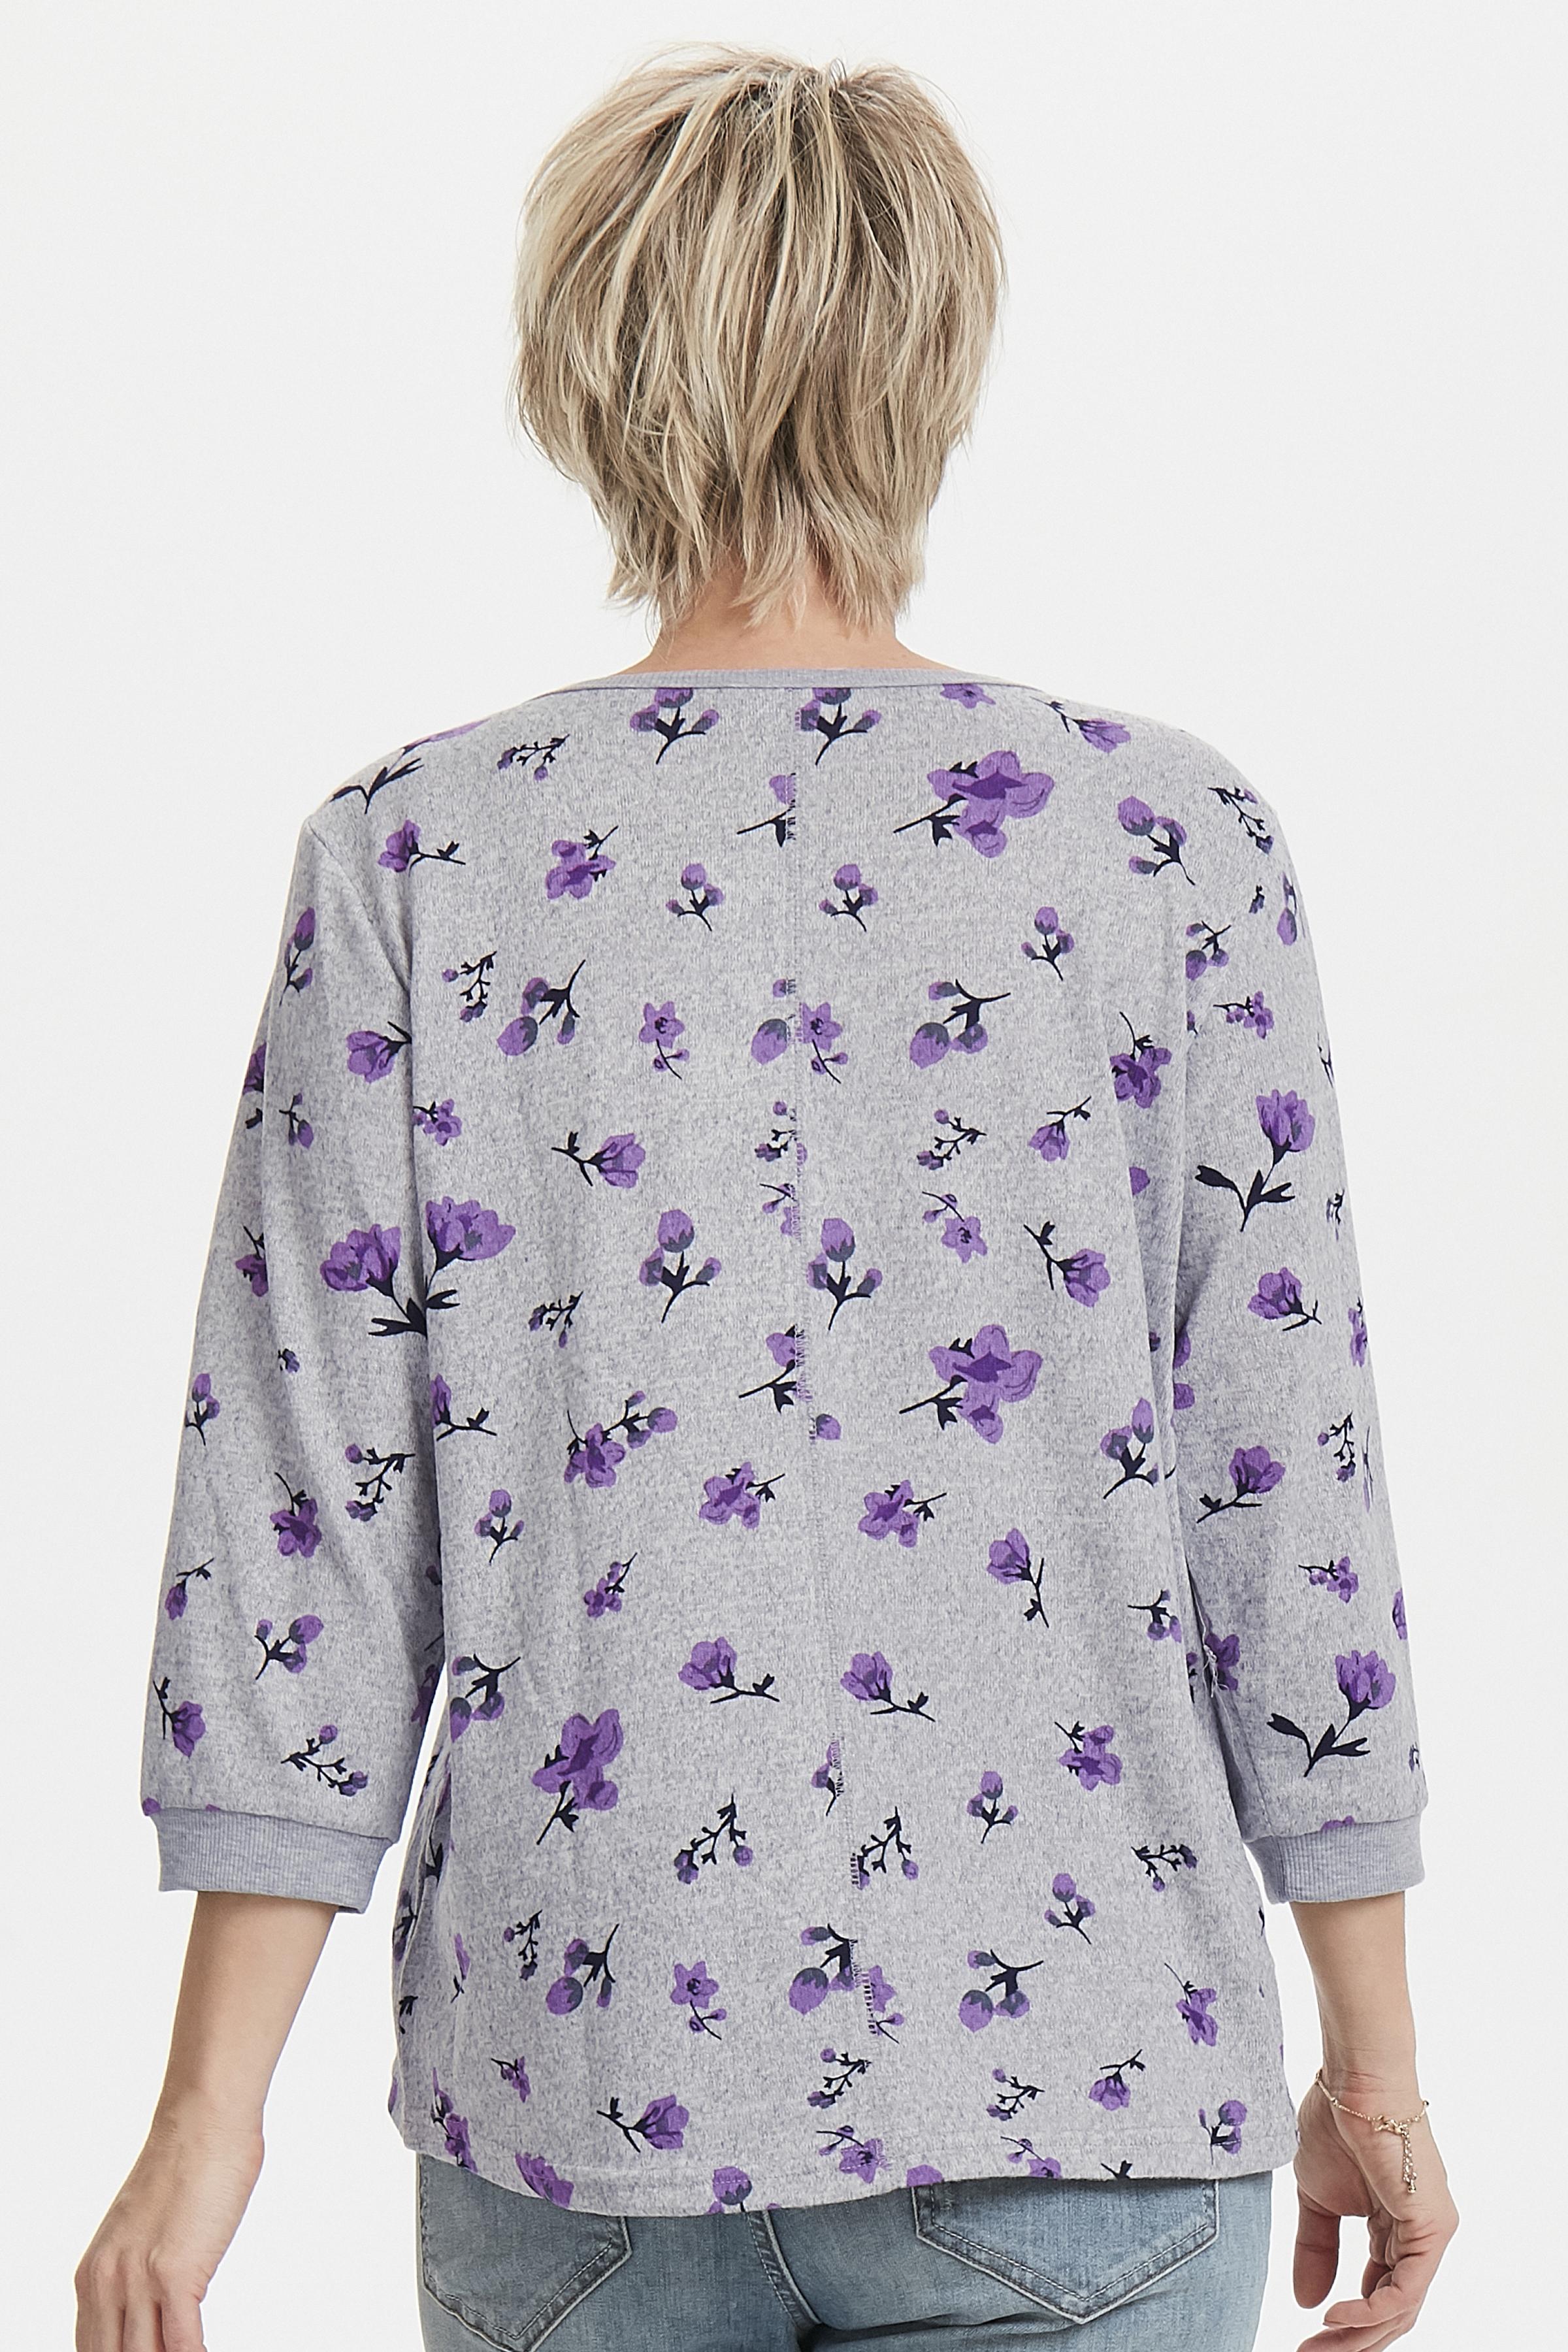 Hellgrau meliert/lila Bluse von Fransa – Shoppen SieHellgrau meliert/lila Bluse ab Gr. XS-XXL hier